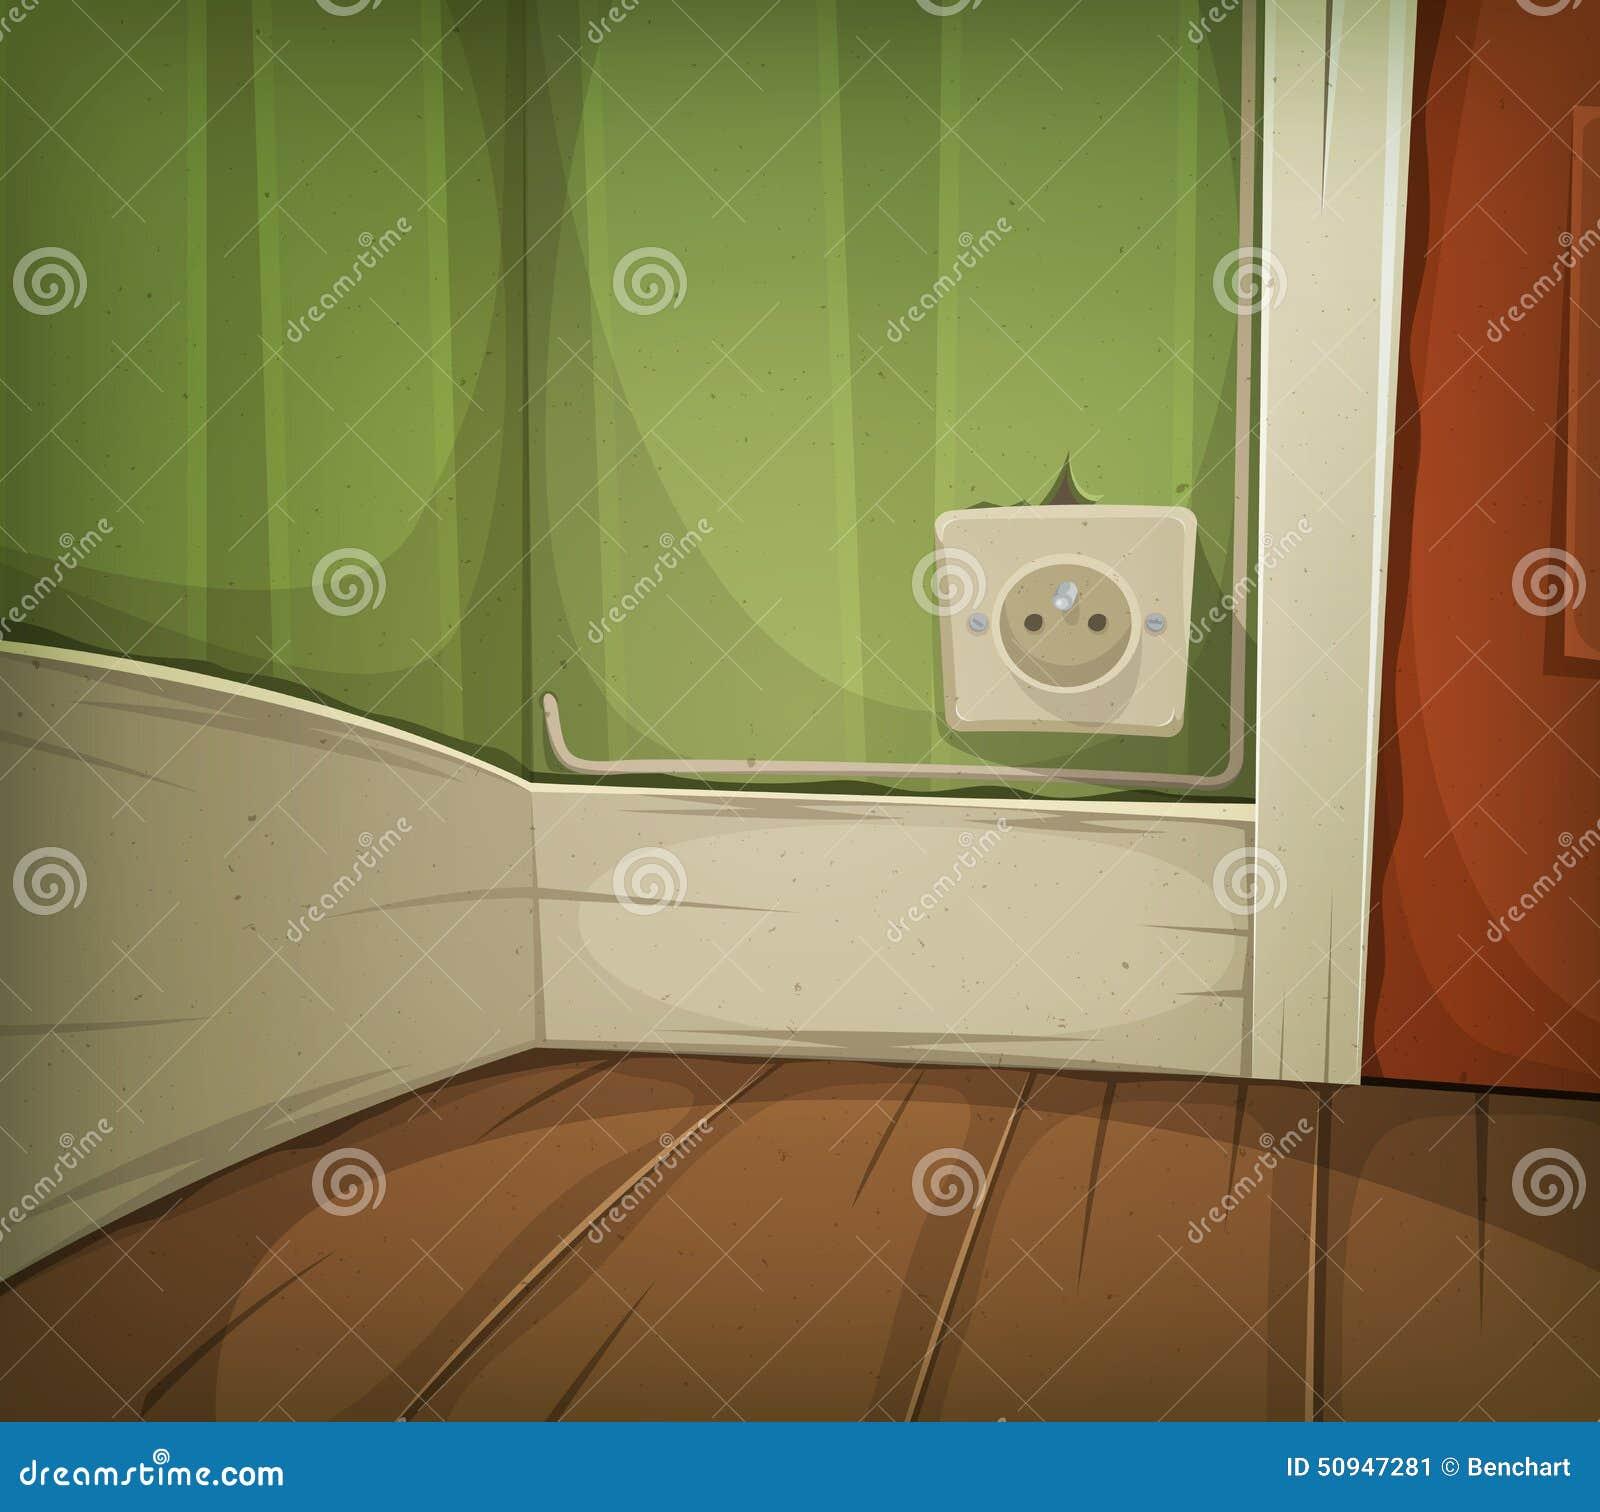 cartoon corner of room close